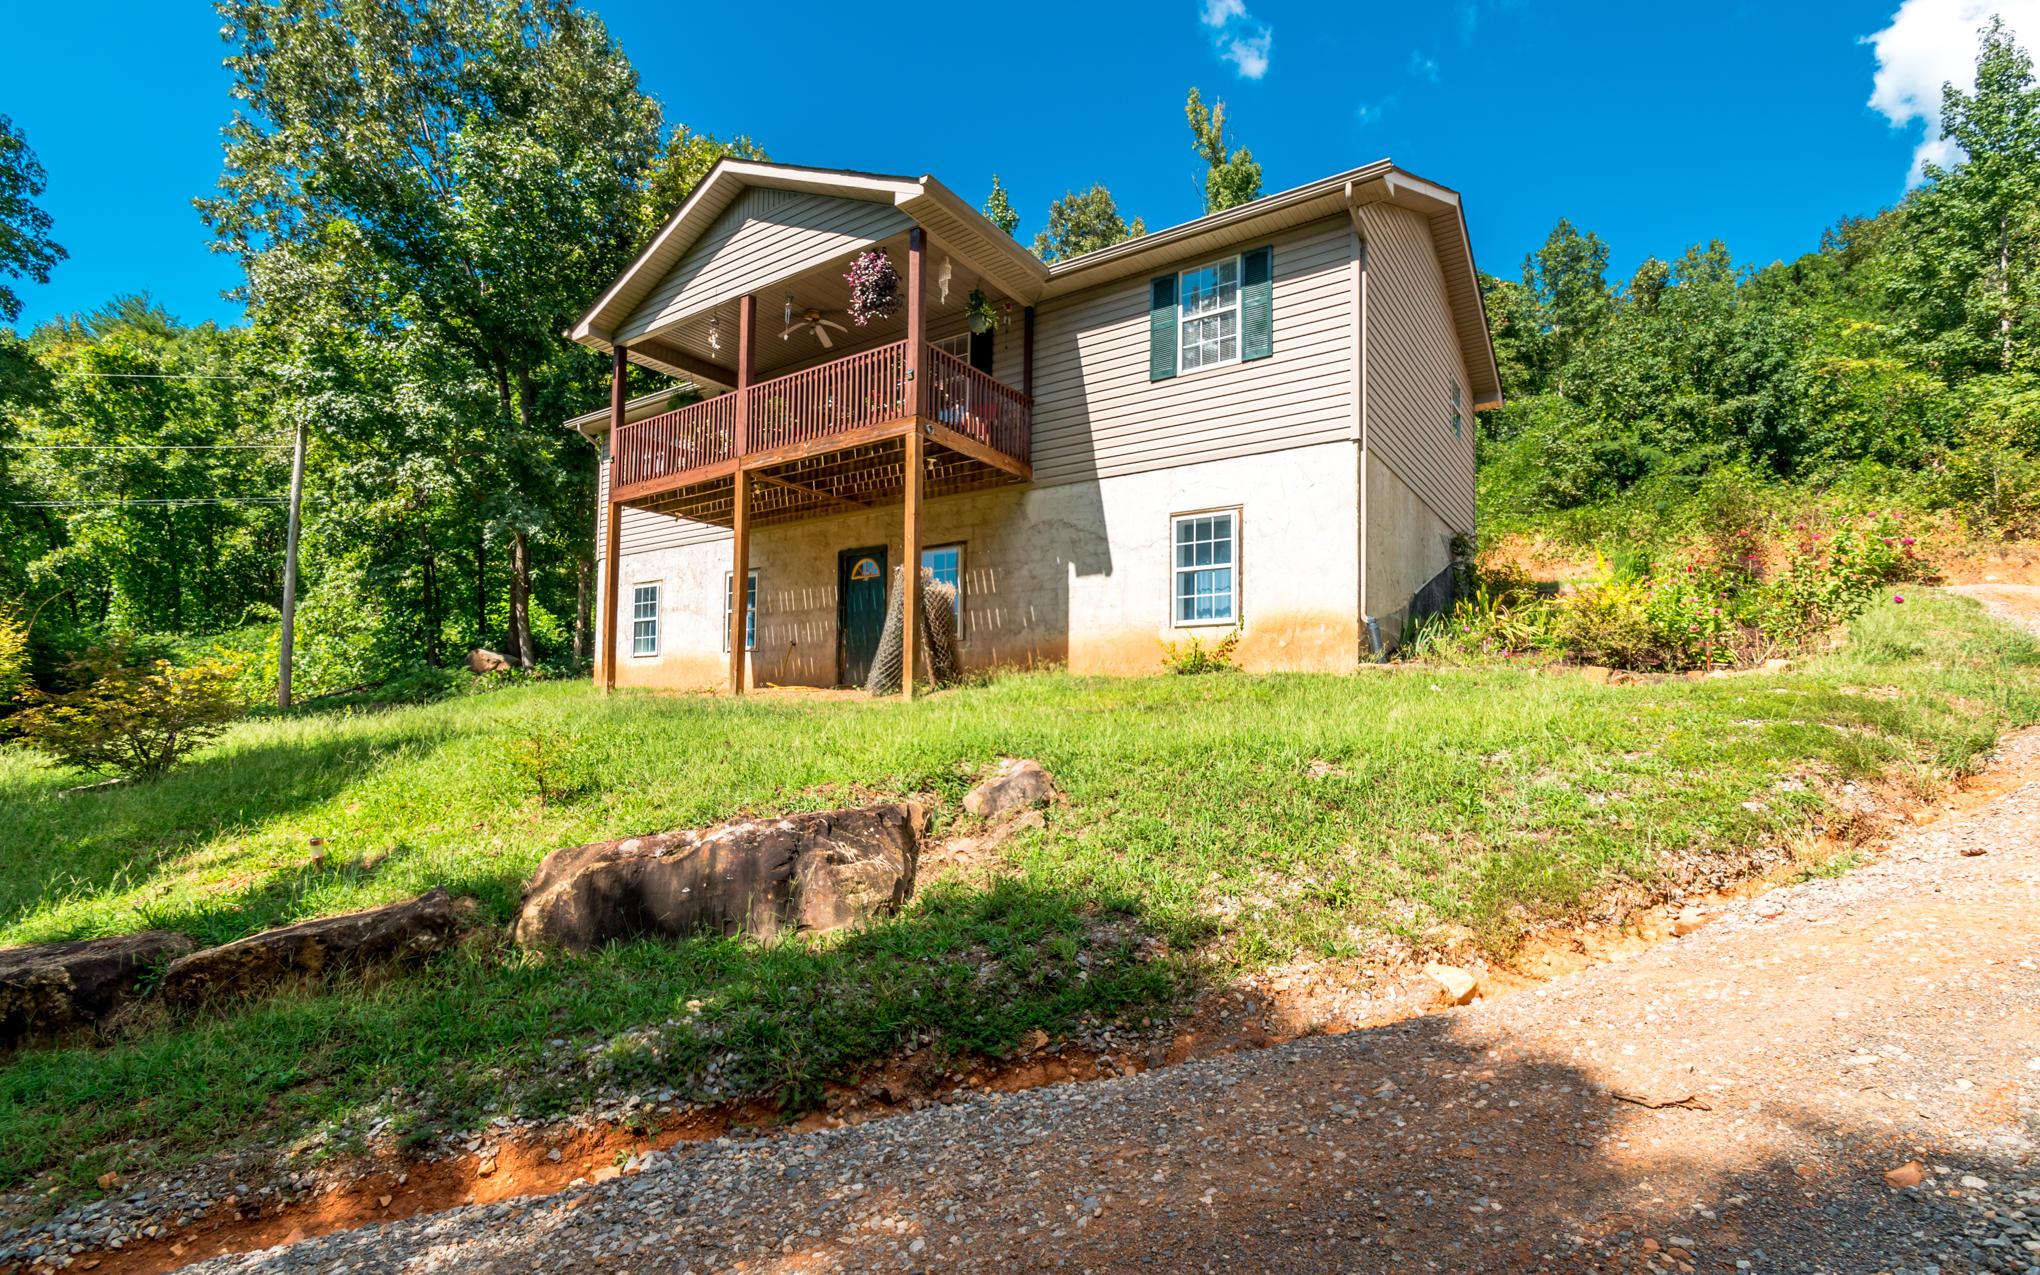 477 Hicks Hollow Rd, Guild, TN 37340